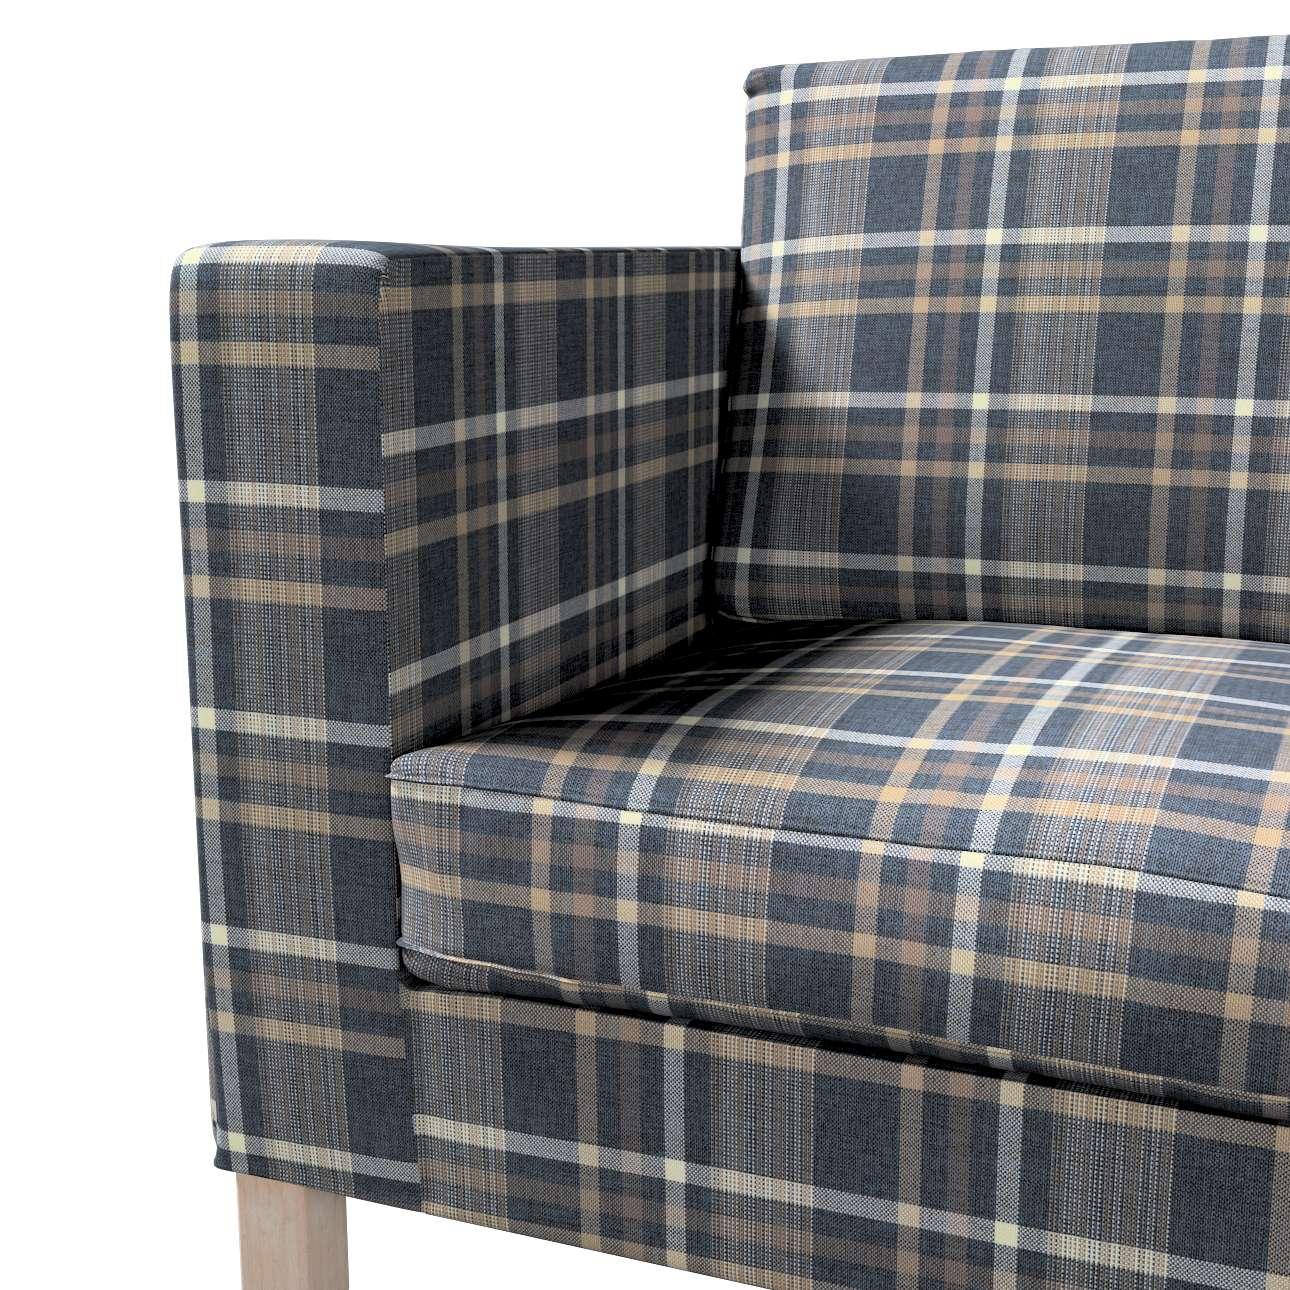 Potah na pohovku IKEA  Karlanda rozkládací, krátký v kolekci Edinburgh, látka: 703-16